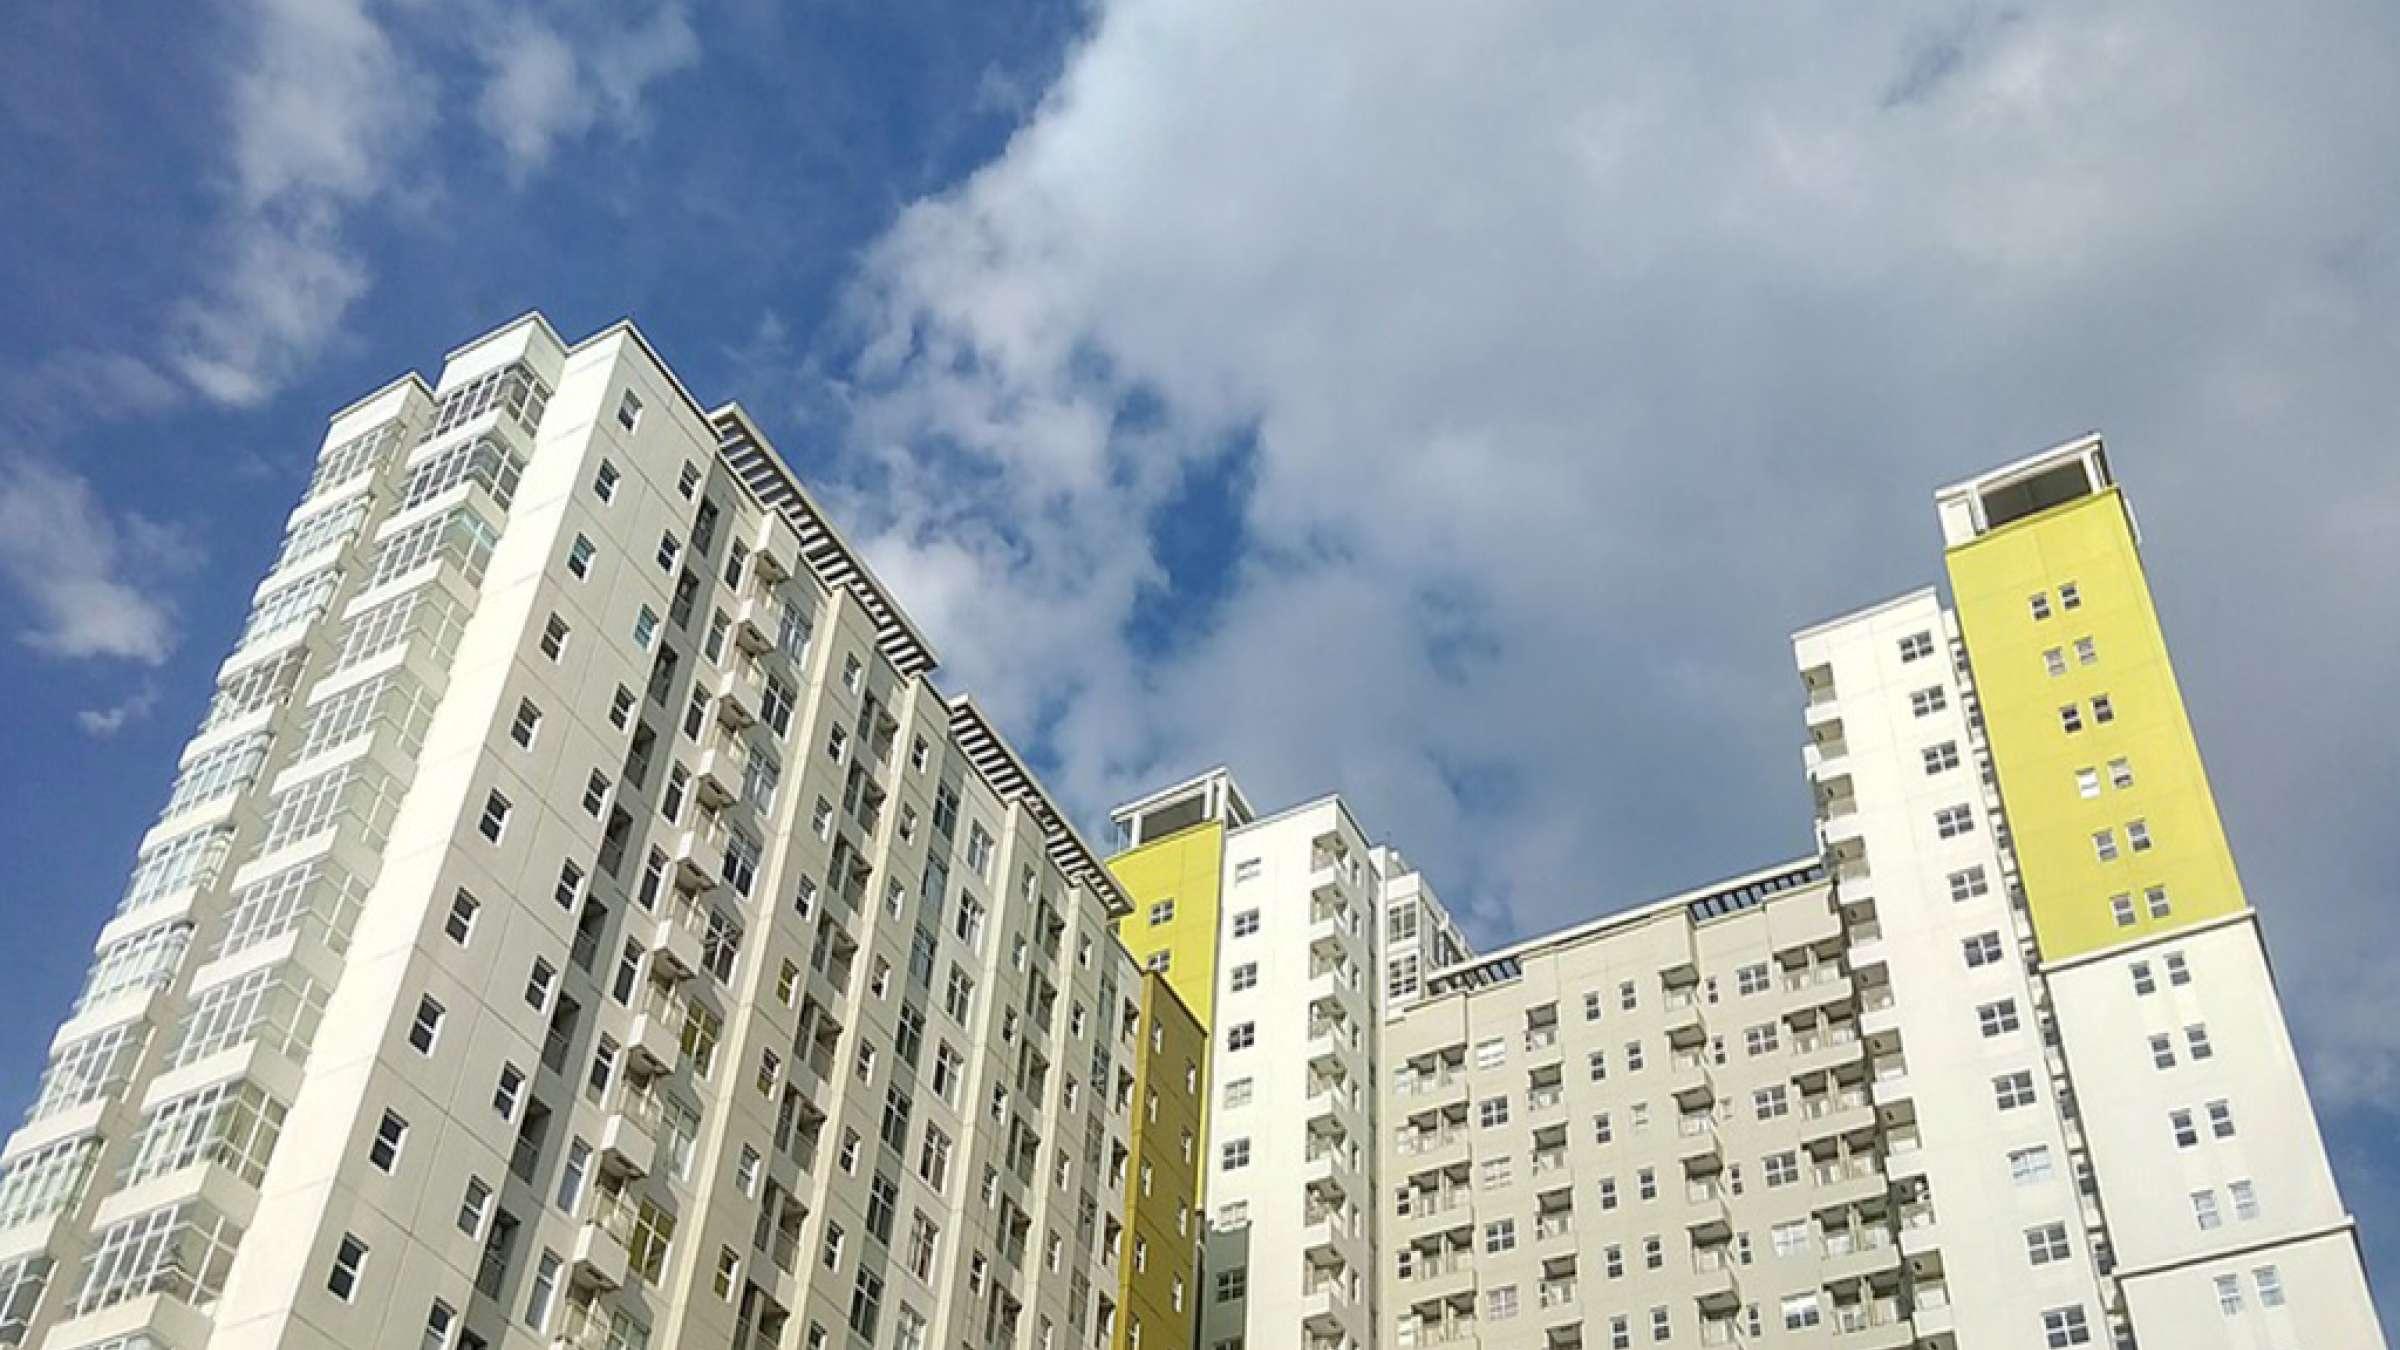 real-estate-siroosi-pish-forosh-condo-downtown-dufferin